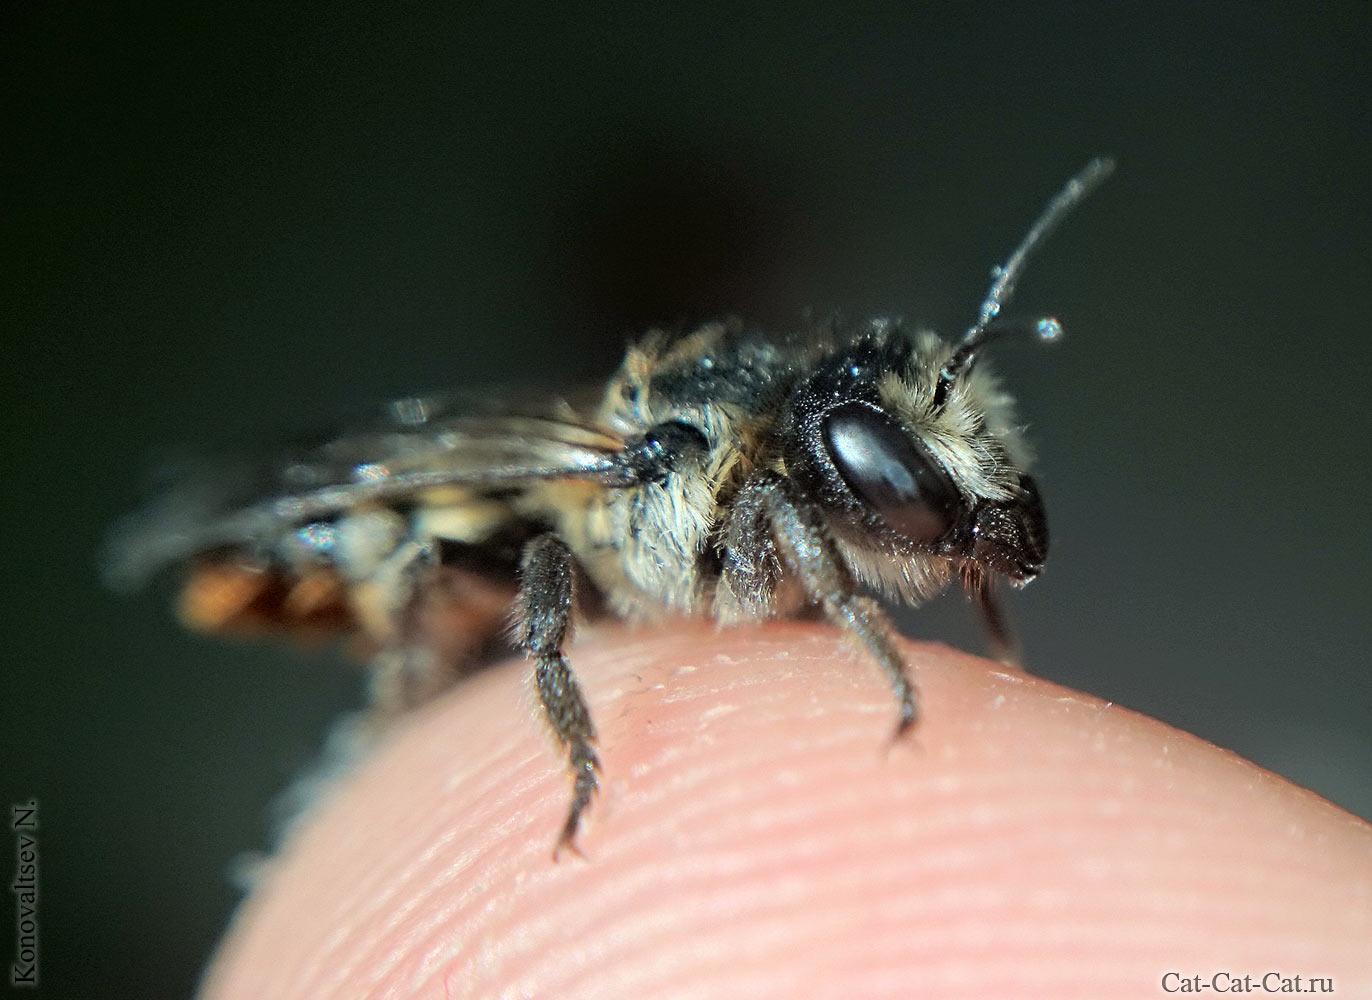 Как я пчелу воспитывал